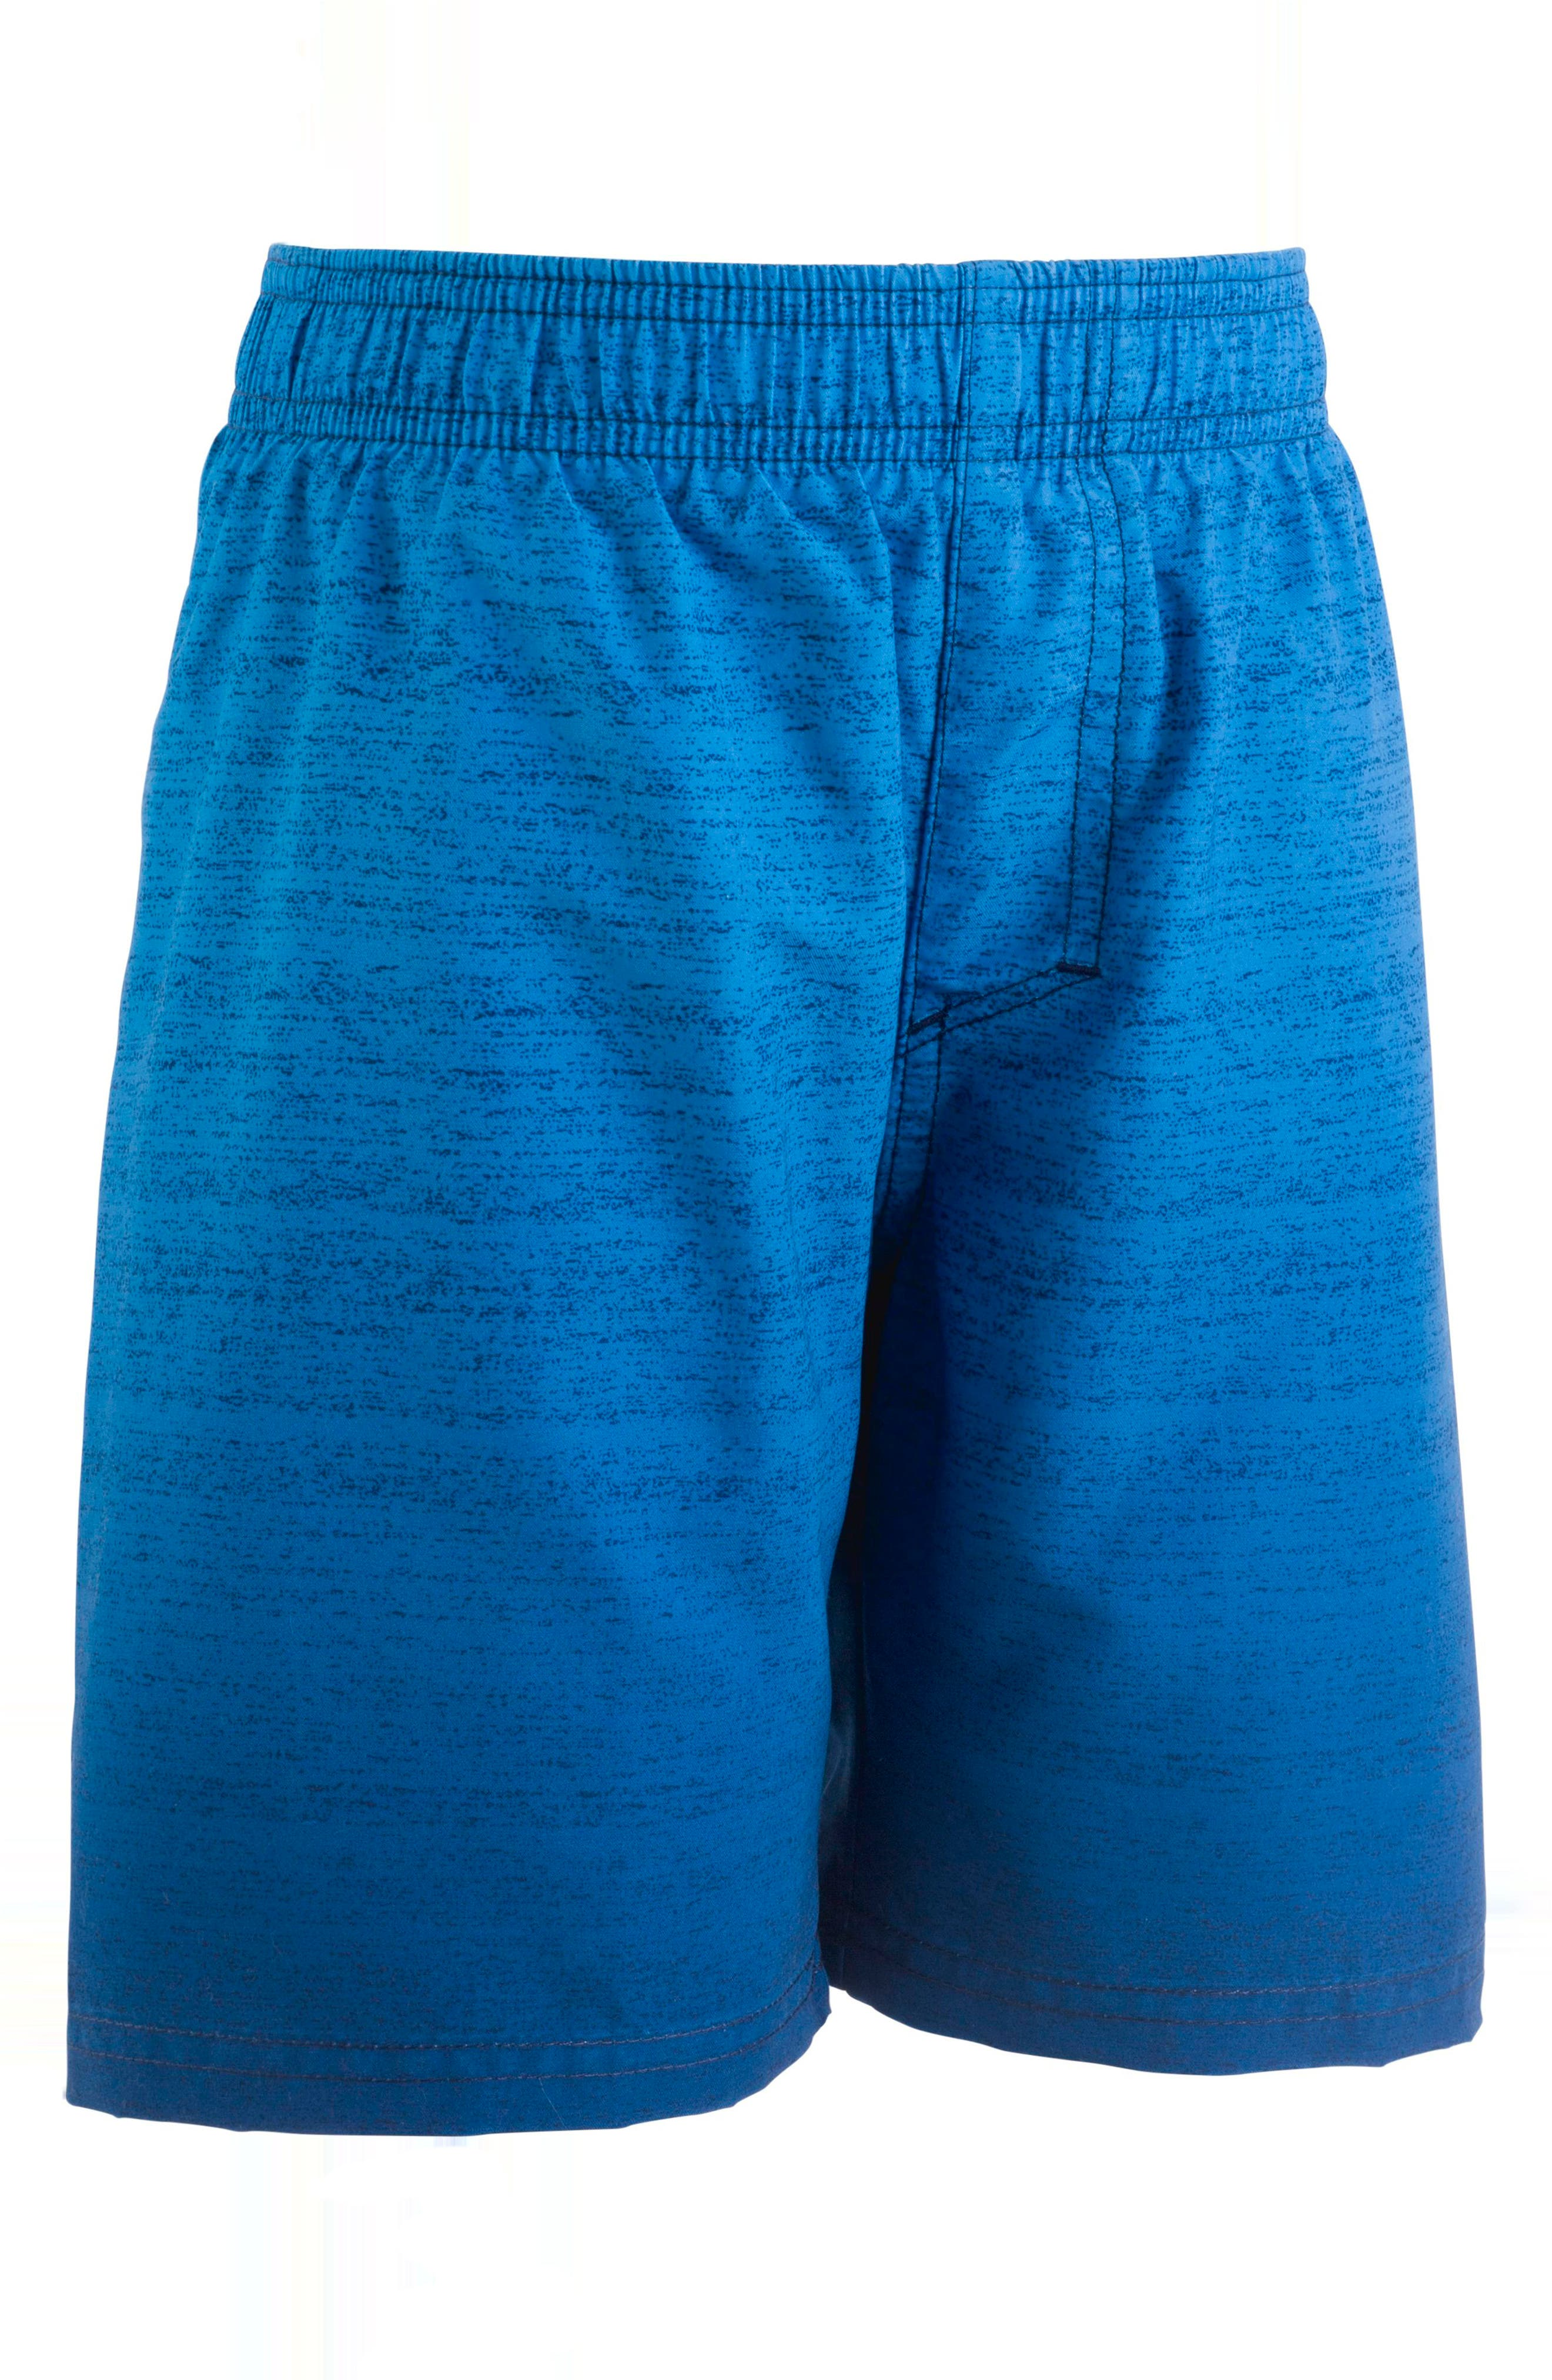 Dipper HeatGear<sup>®</sup> Volley Shorts,                         Main,                         color, Academy